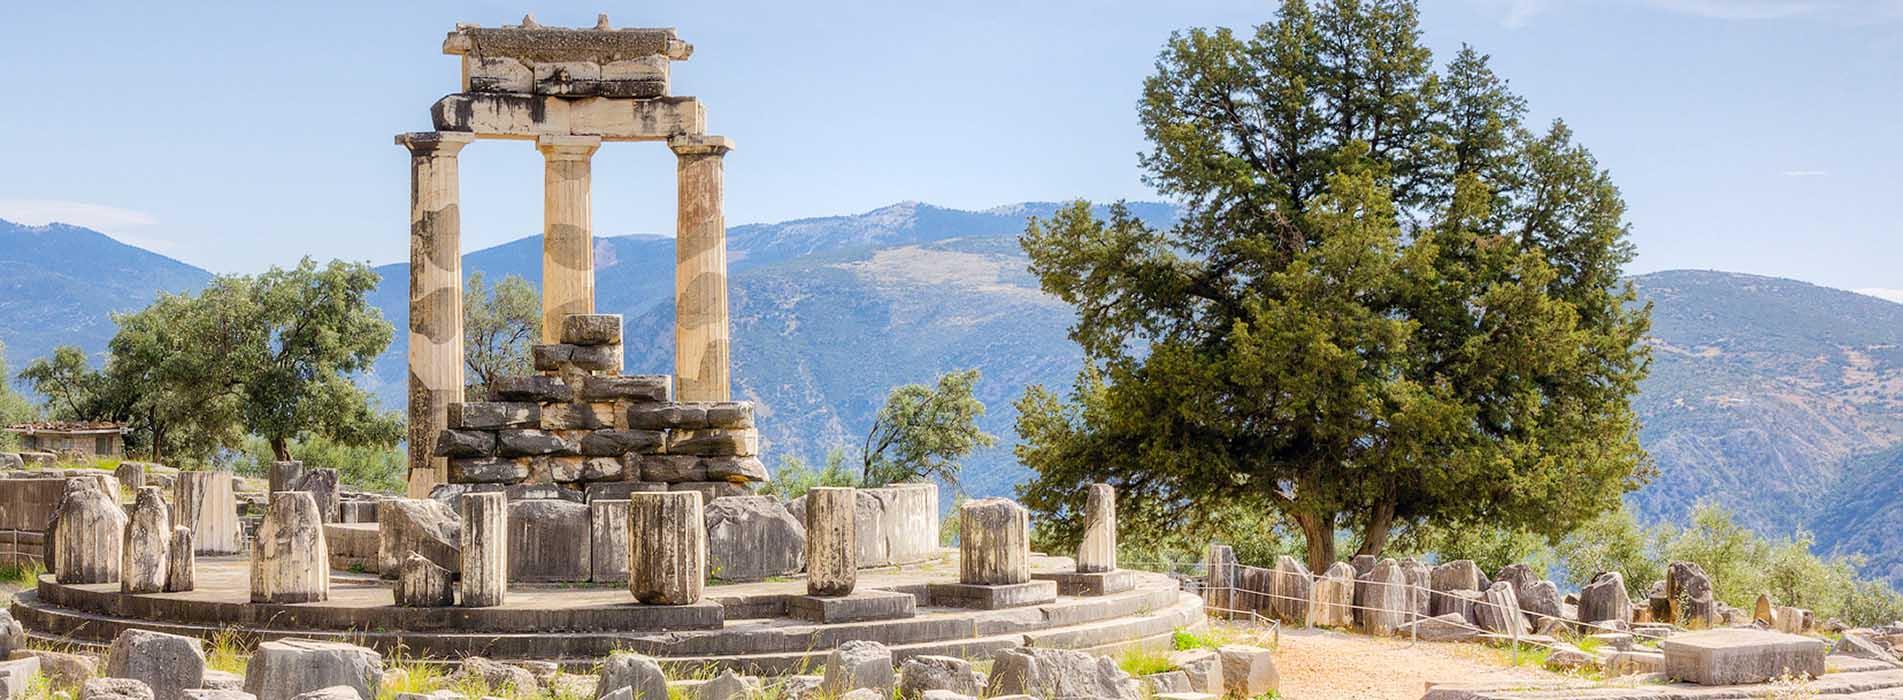 Greece - Delphi 6 (main)